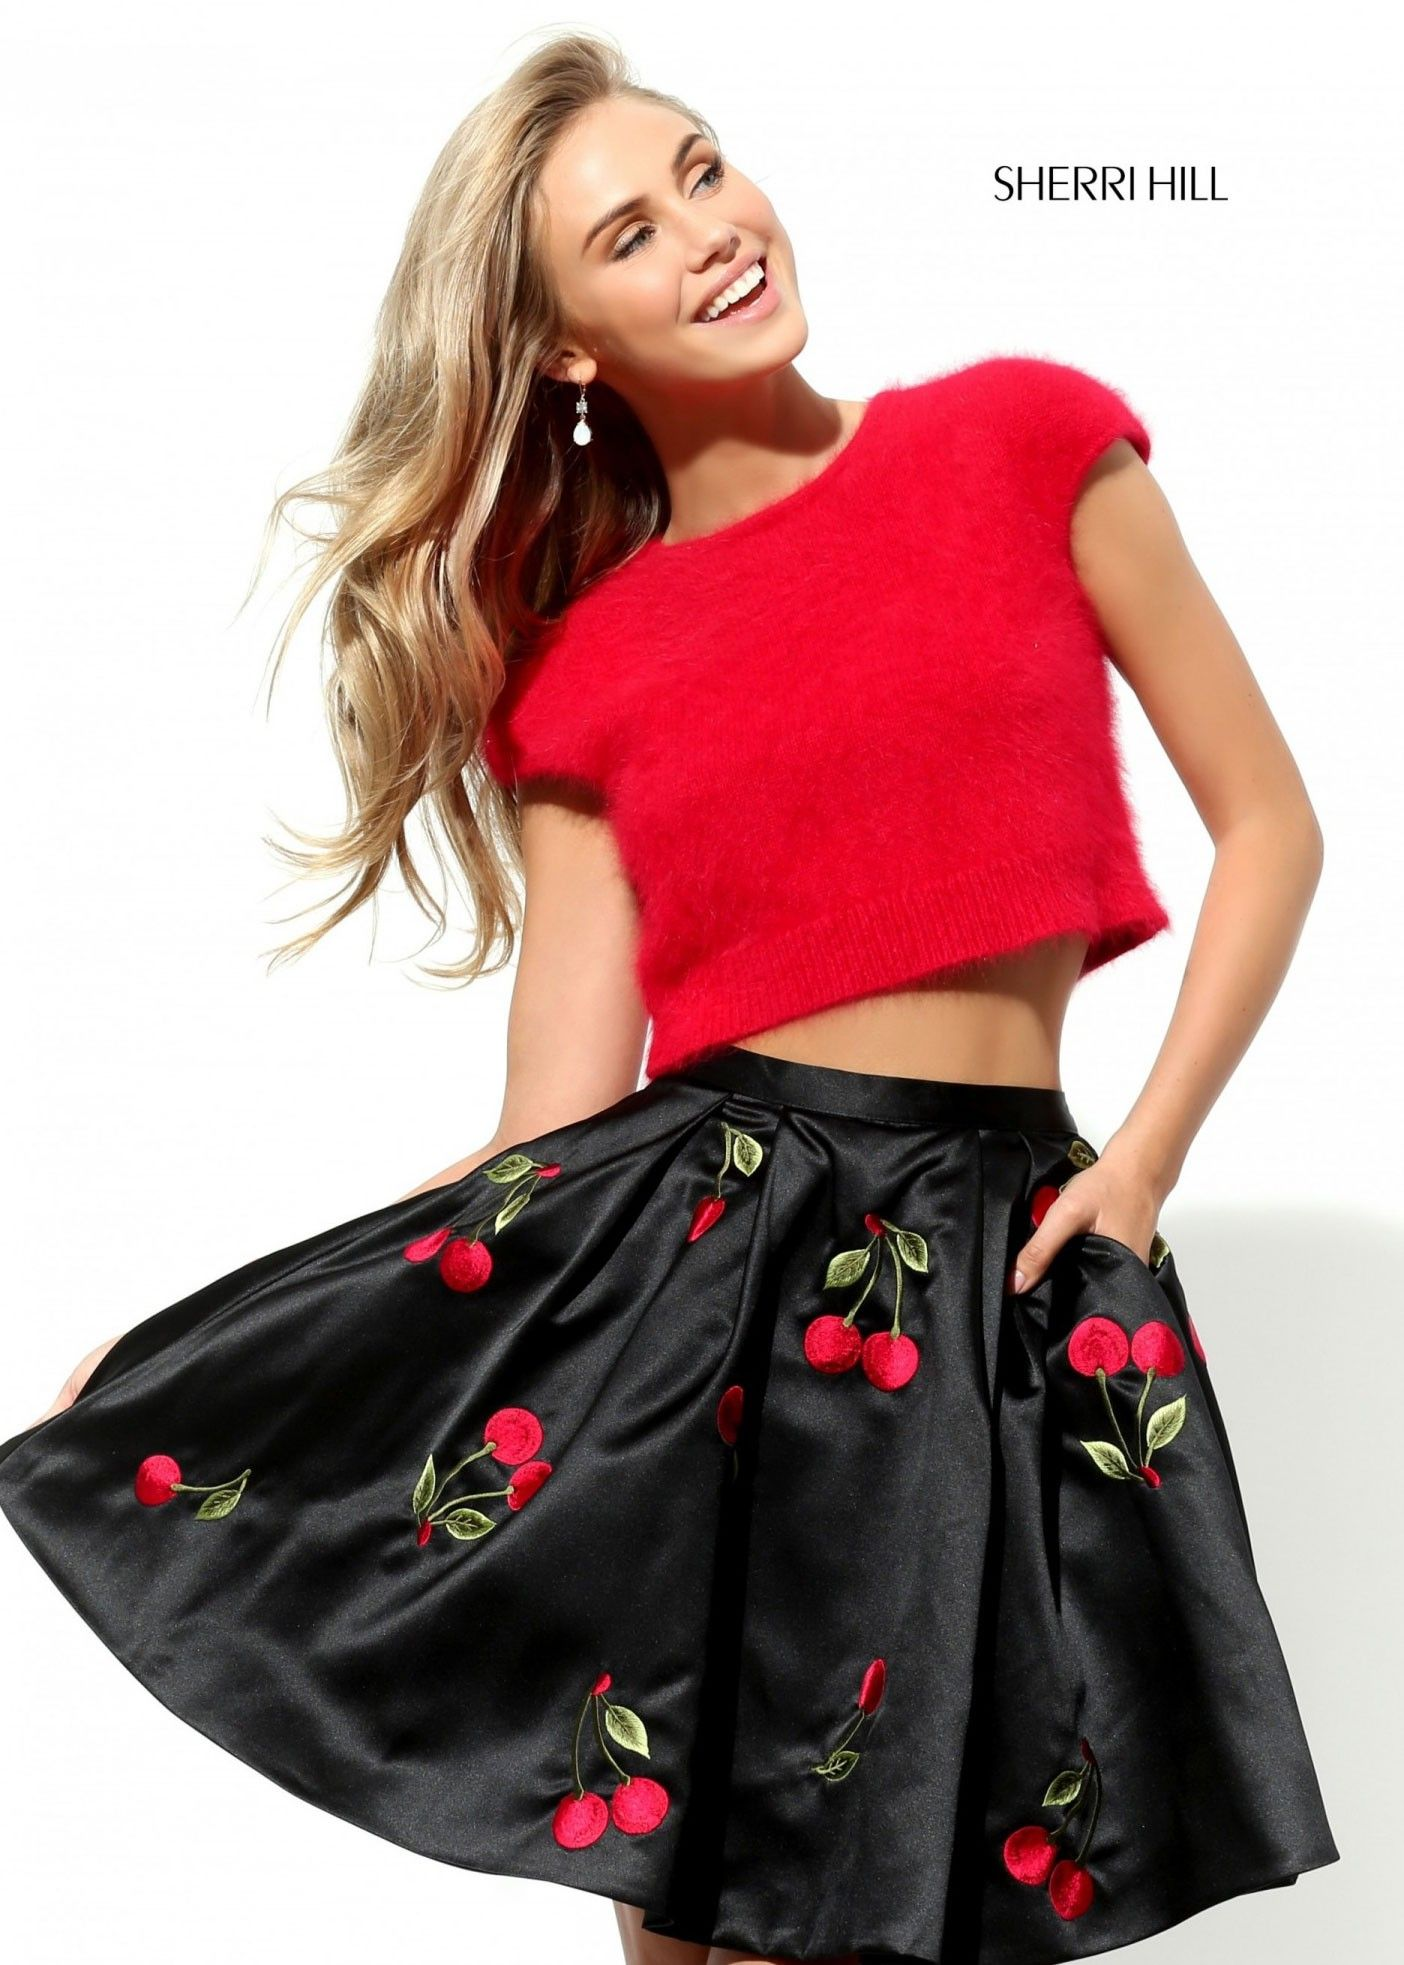 813c92d83 Sherri Hill 50553 Two Piece Cherries Dress | Two Piece Dresses ...